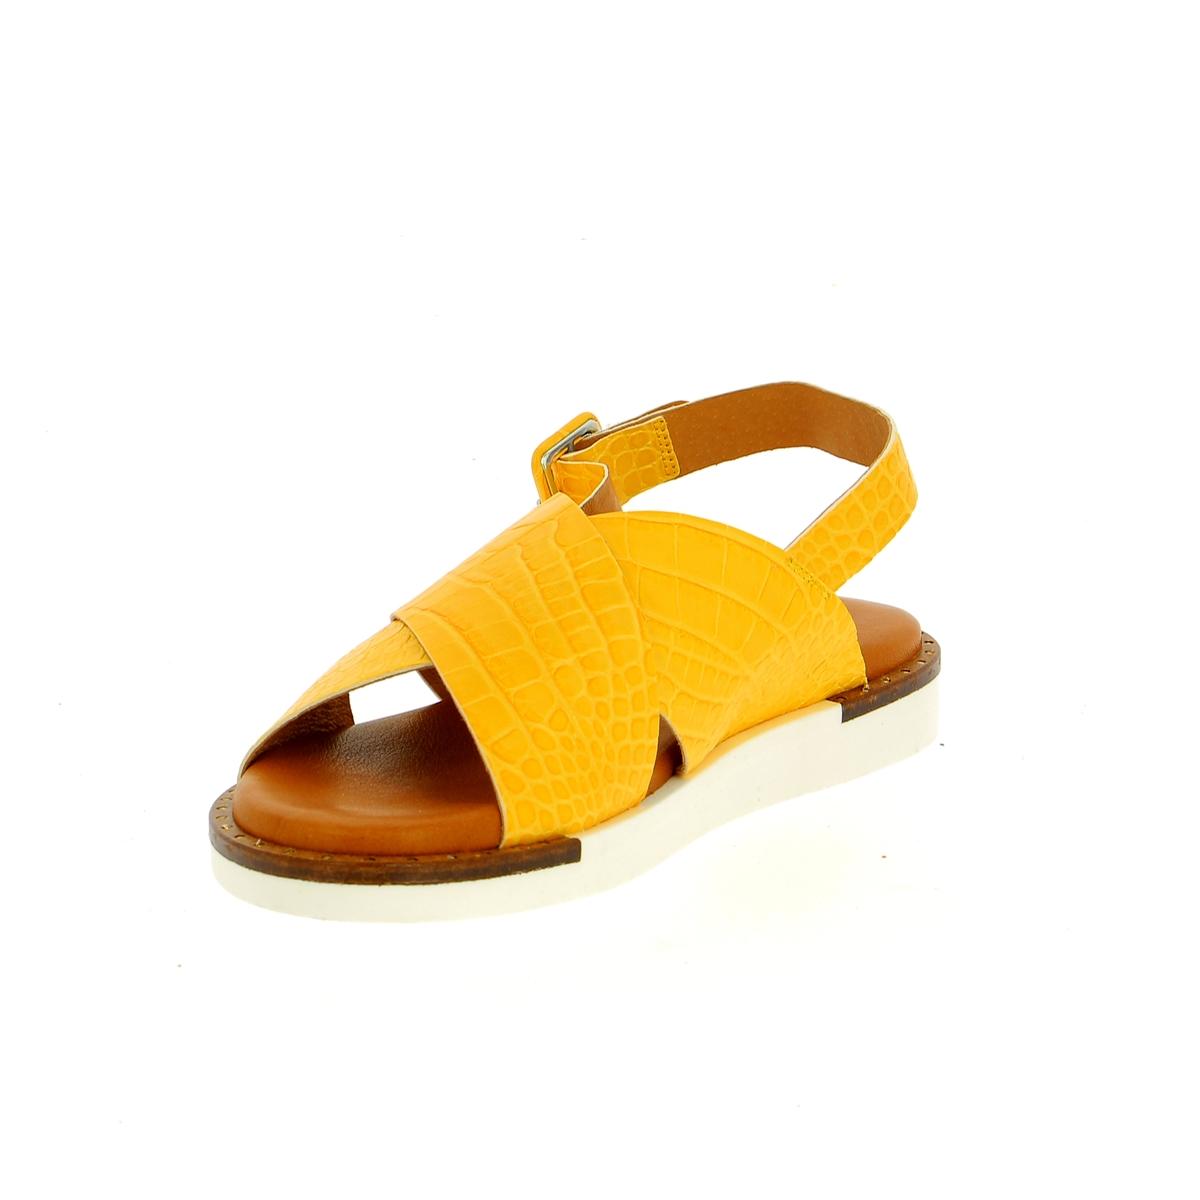 J'hay Sandales jaune